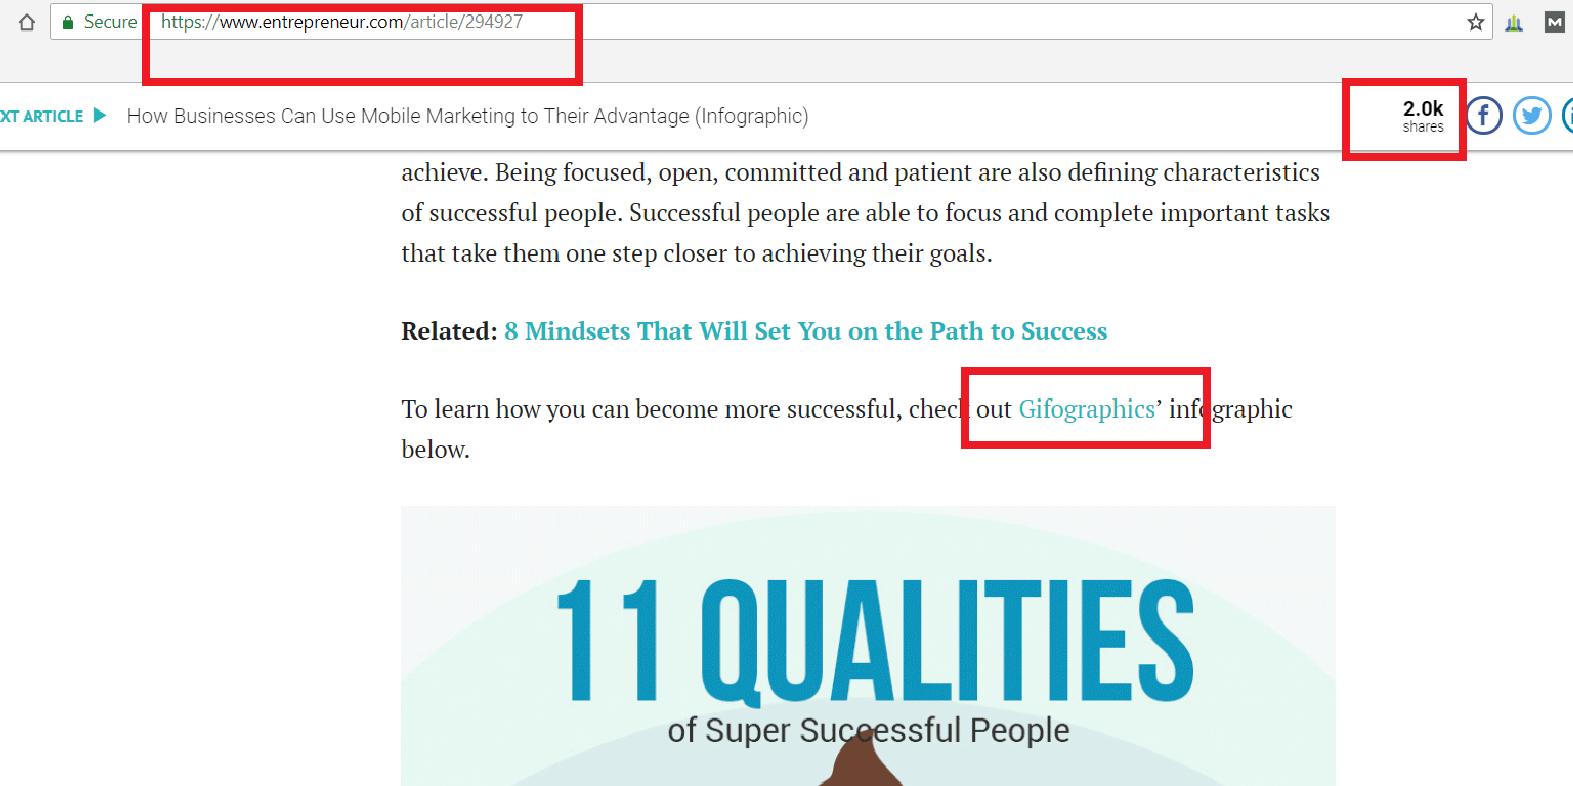 Entrepreneur.com - website traffic